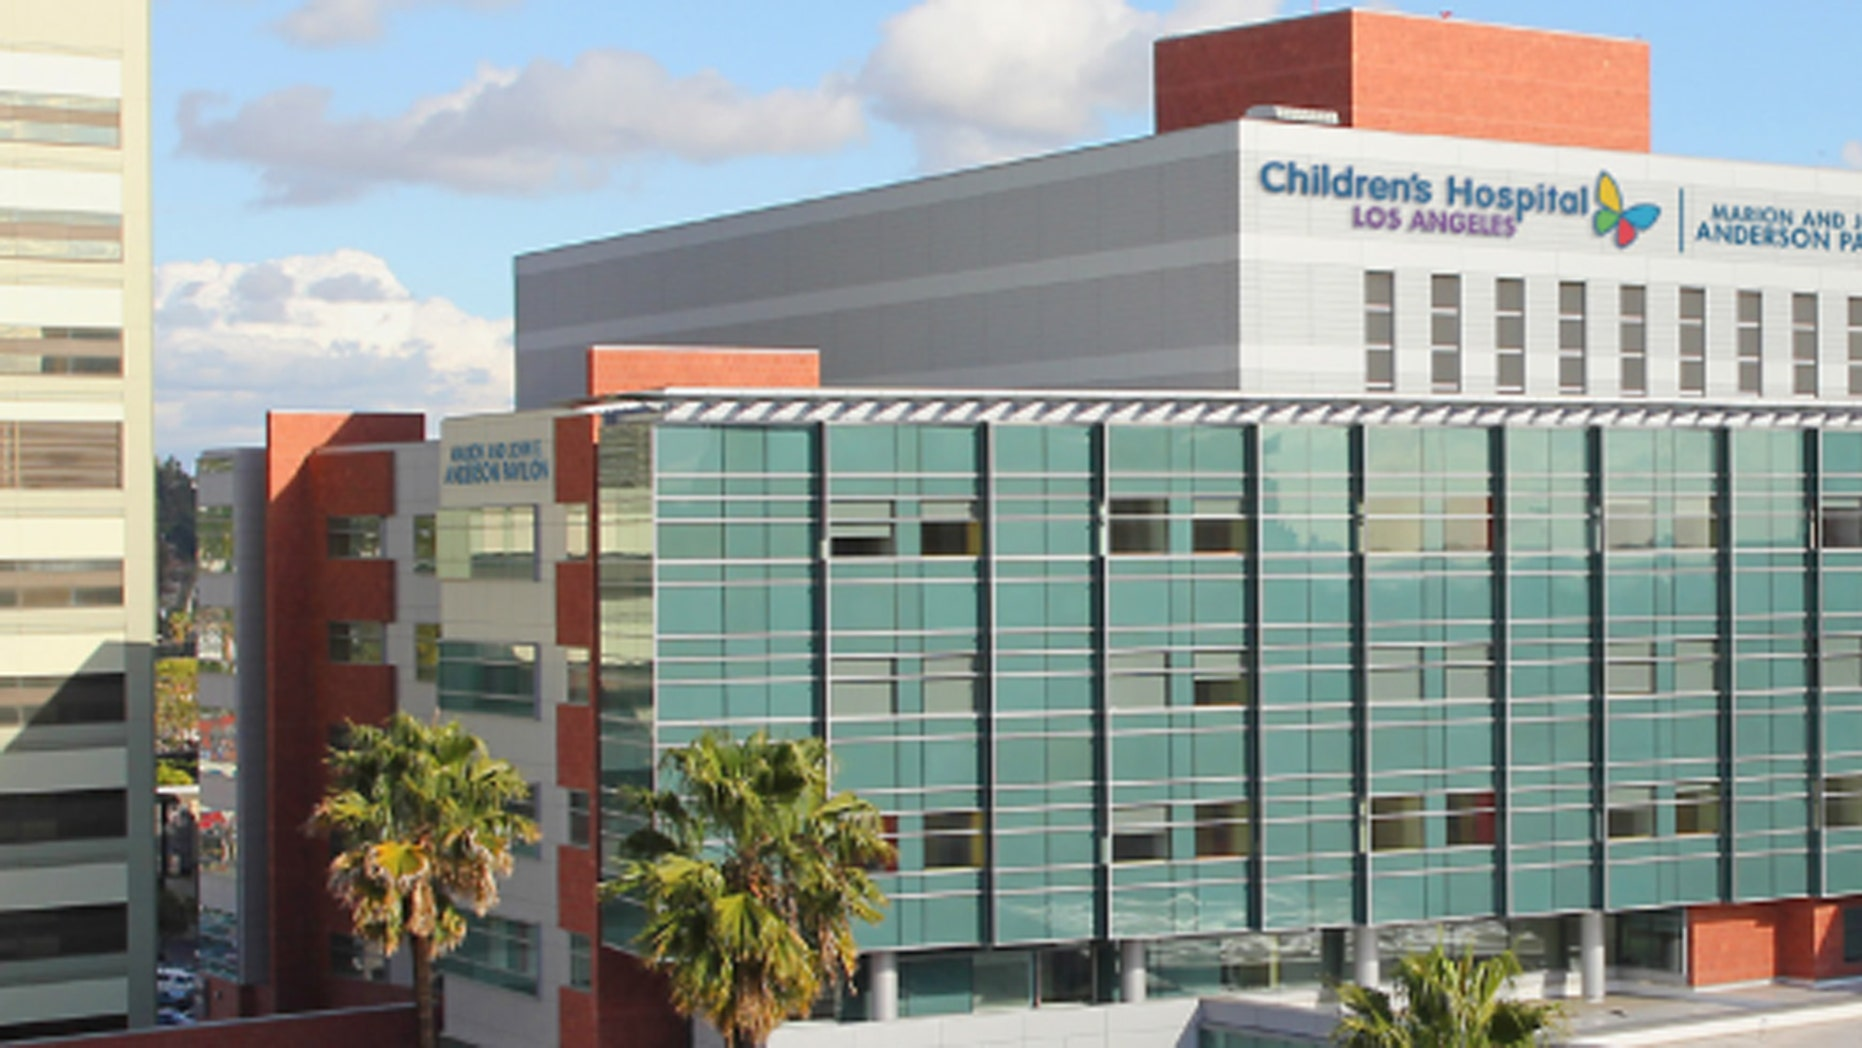 (Credit: Children's Hospital Los Angeles)